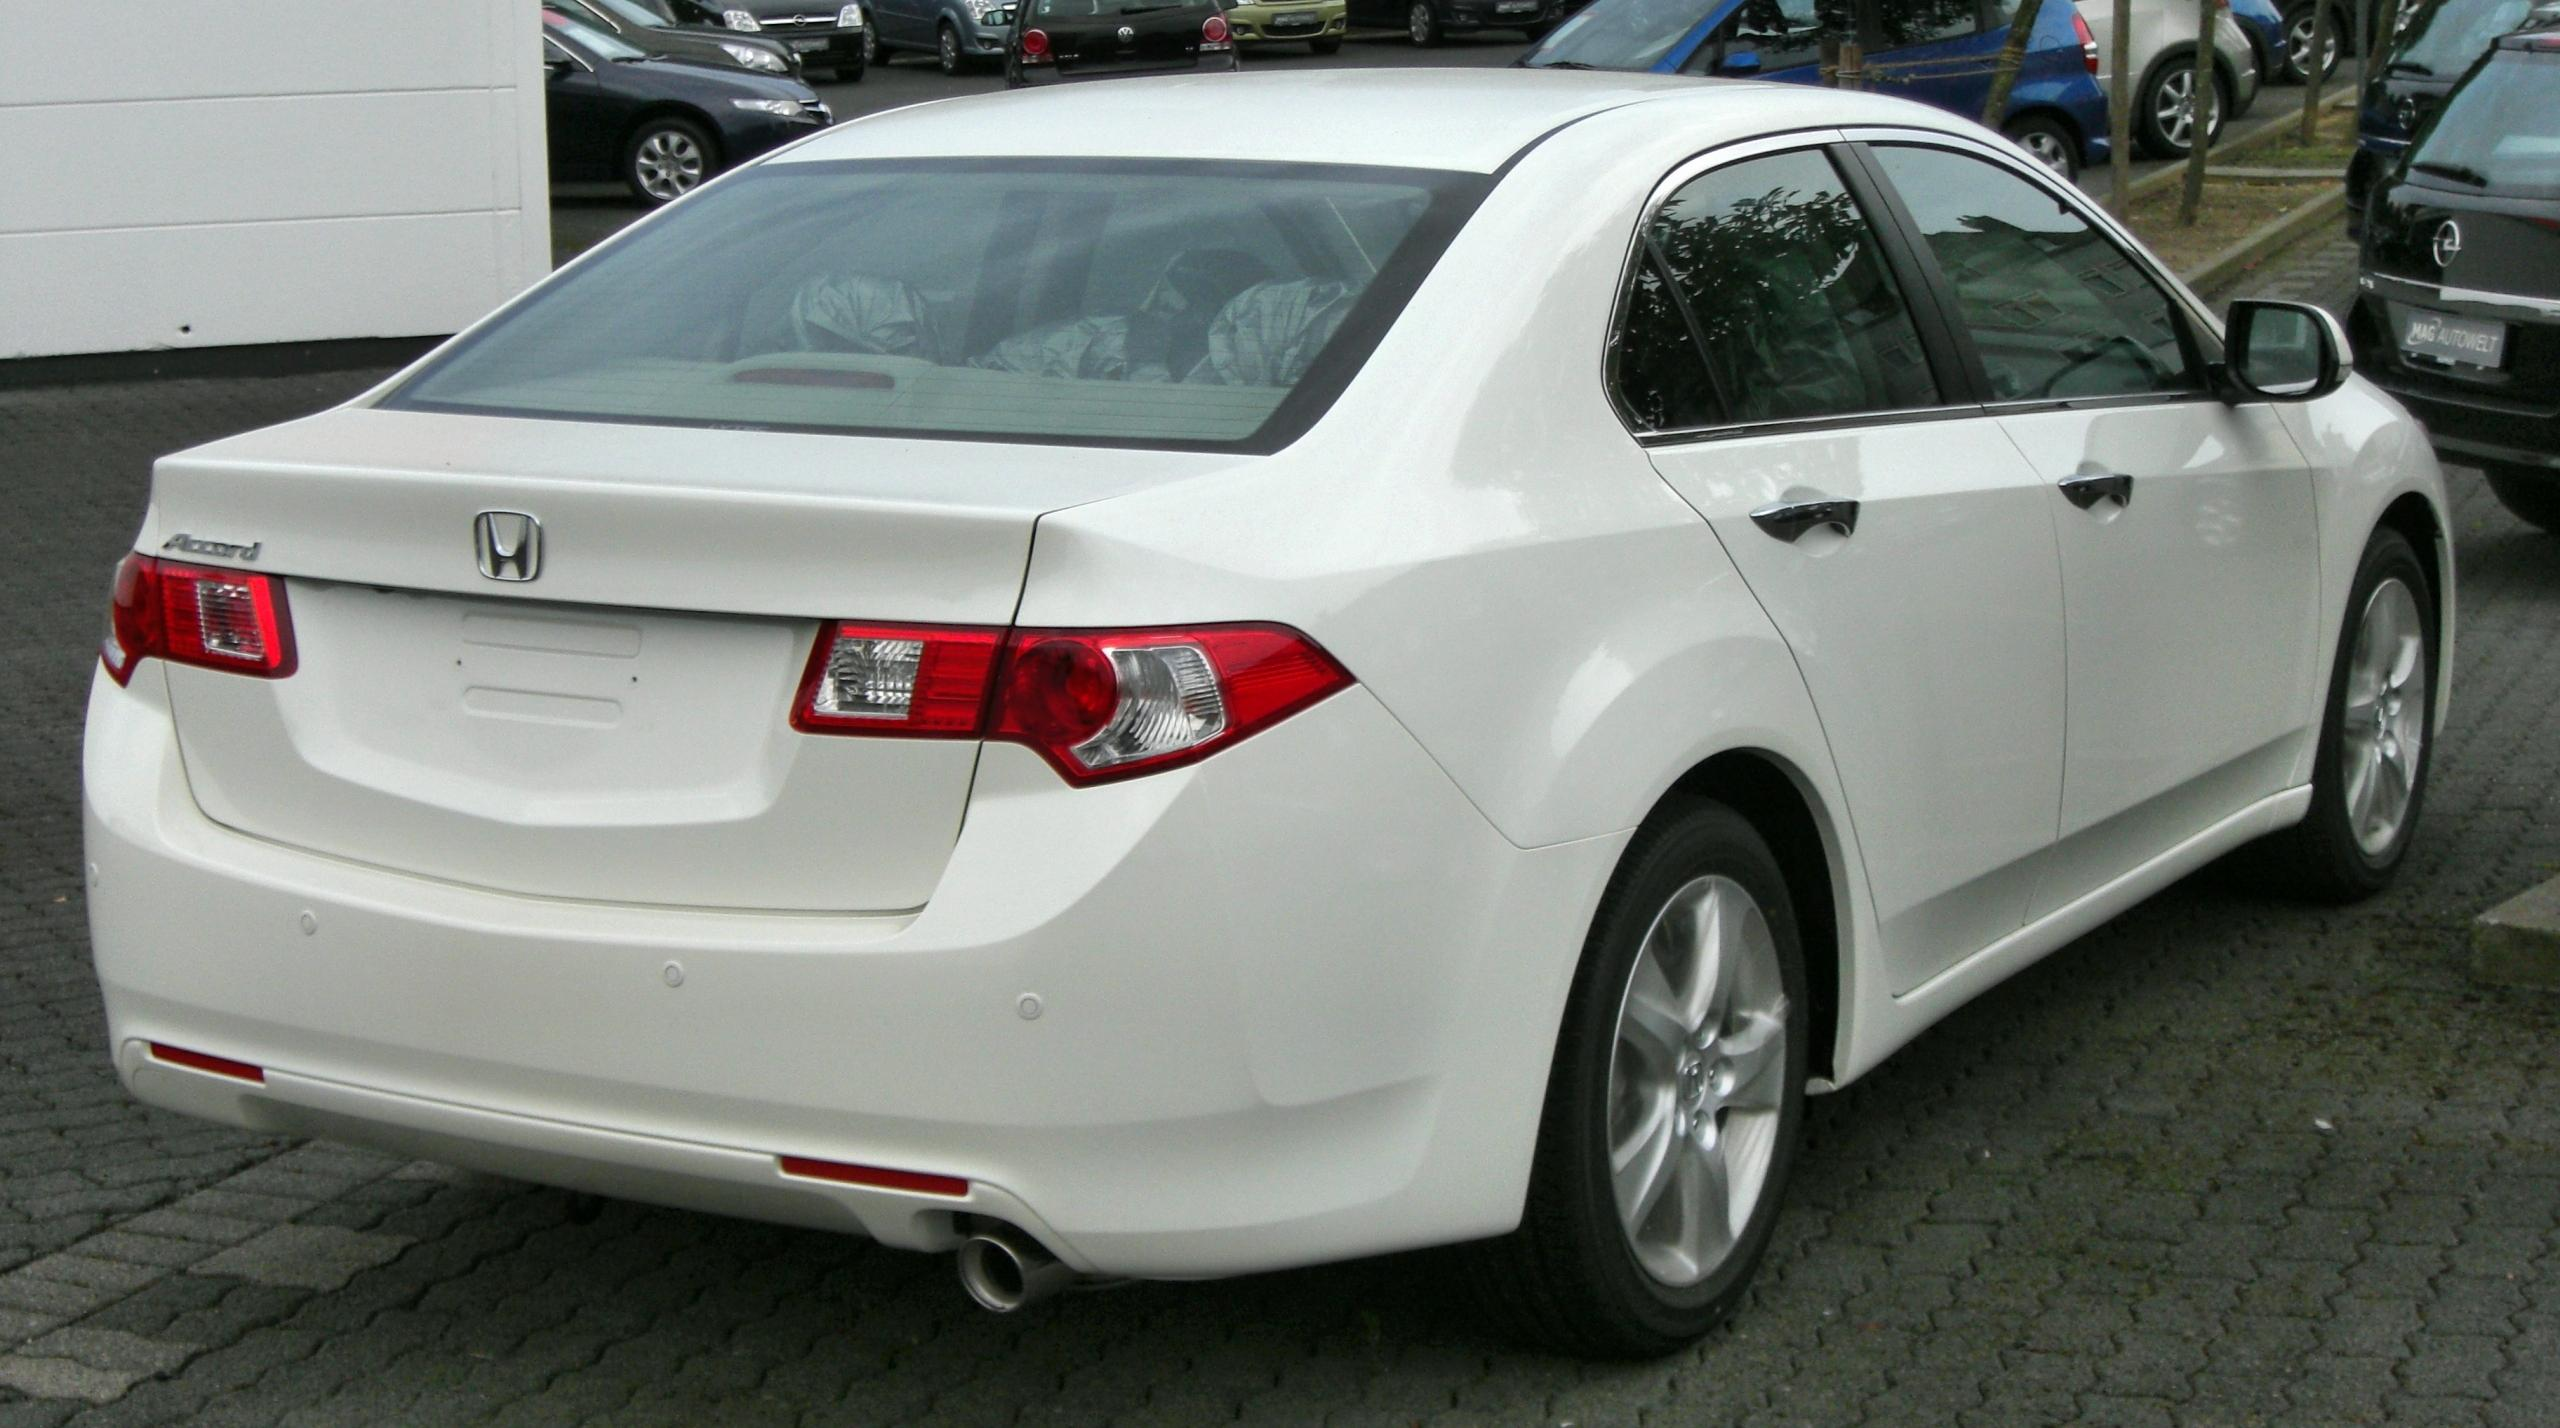 File:Honda Accord (2008) rear.JPG